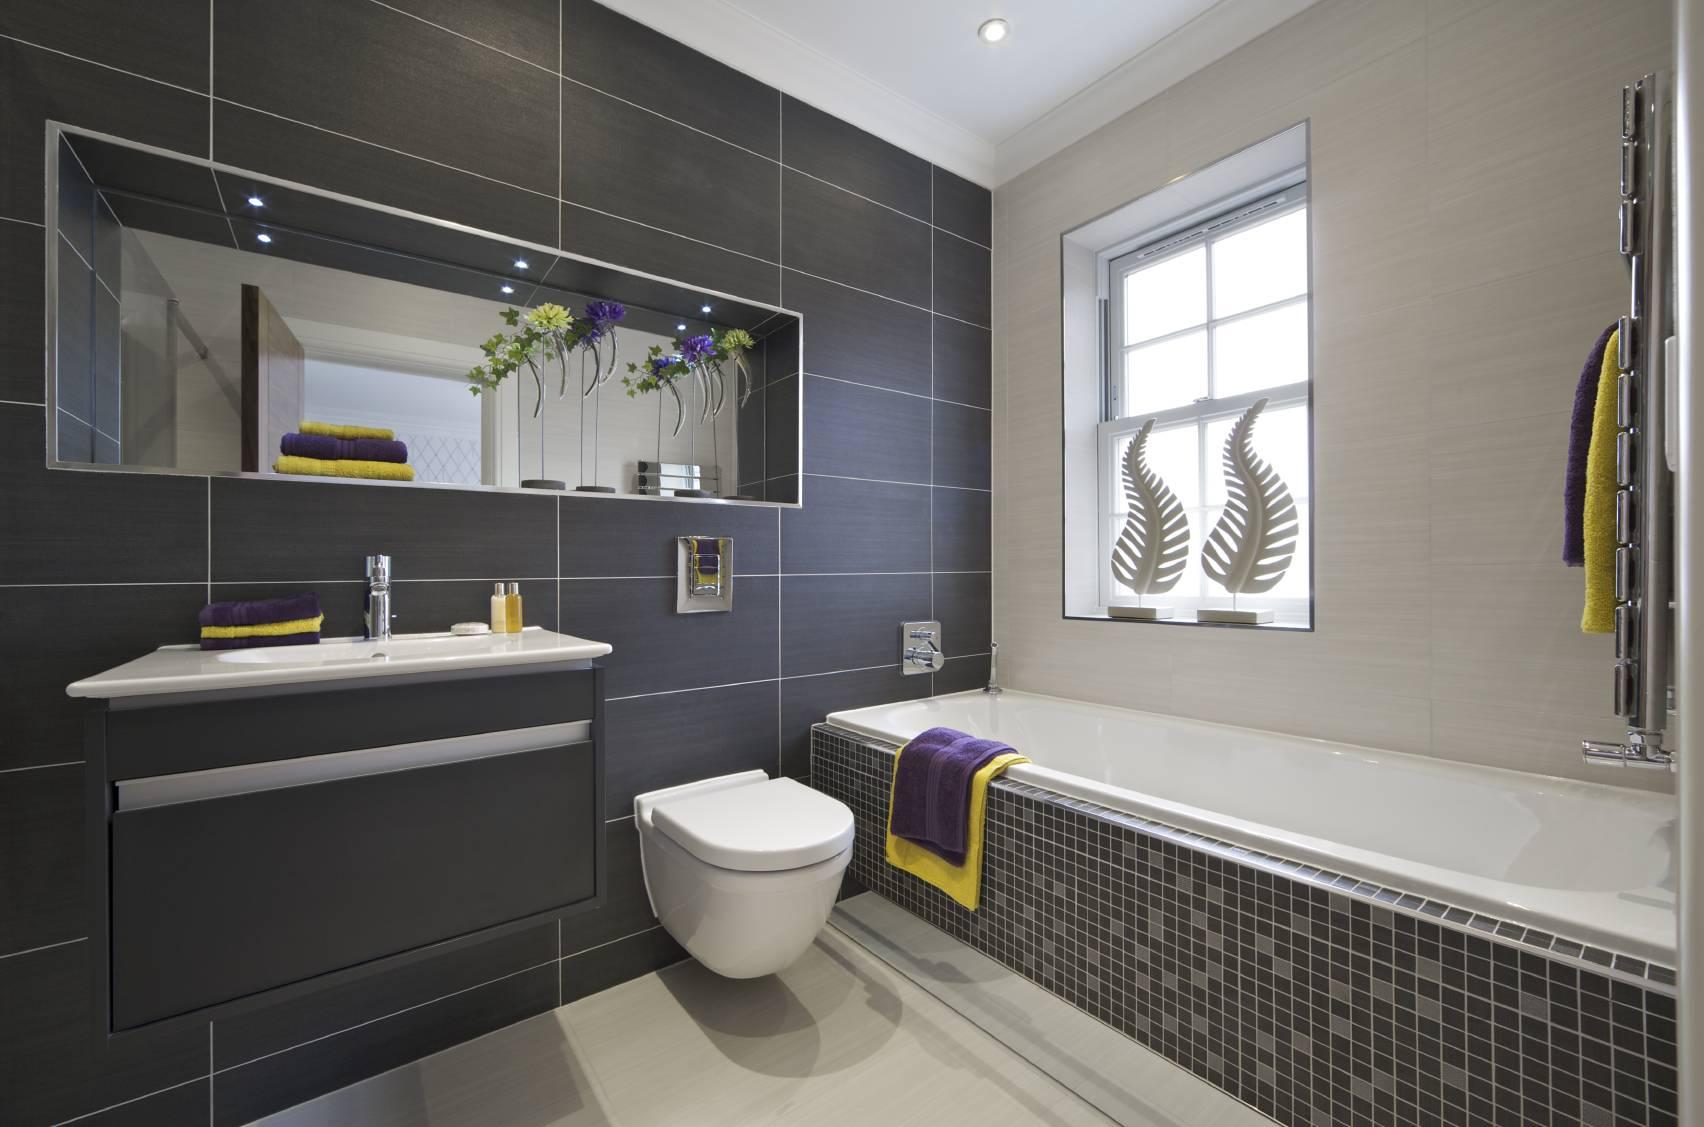 Comment choisir son miroir pour sa salle de bain for Photo salle de bain design